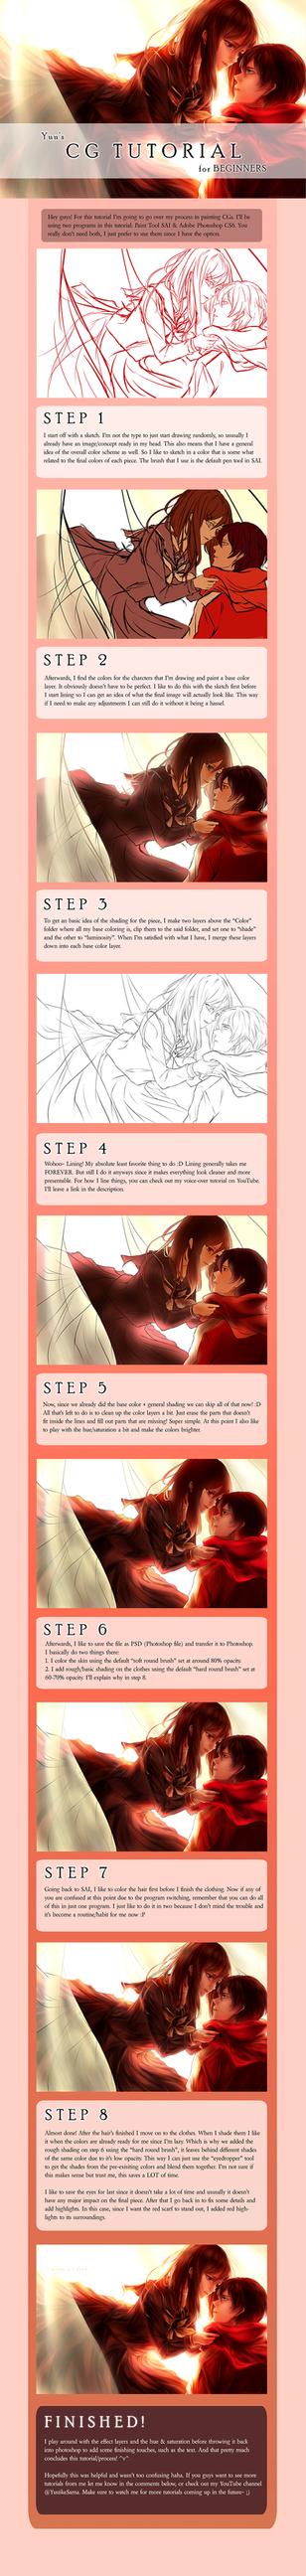 Yuu's CG Tutorial: How I draw/my process by yuuike